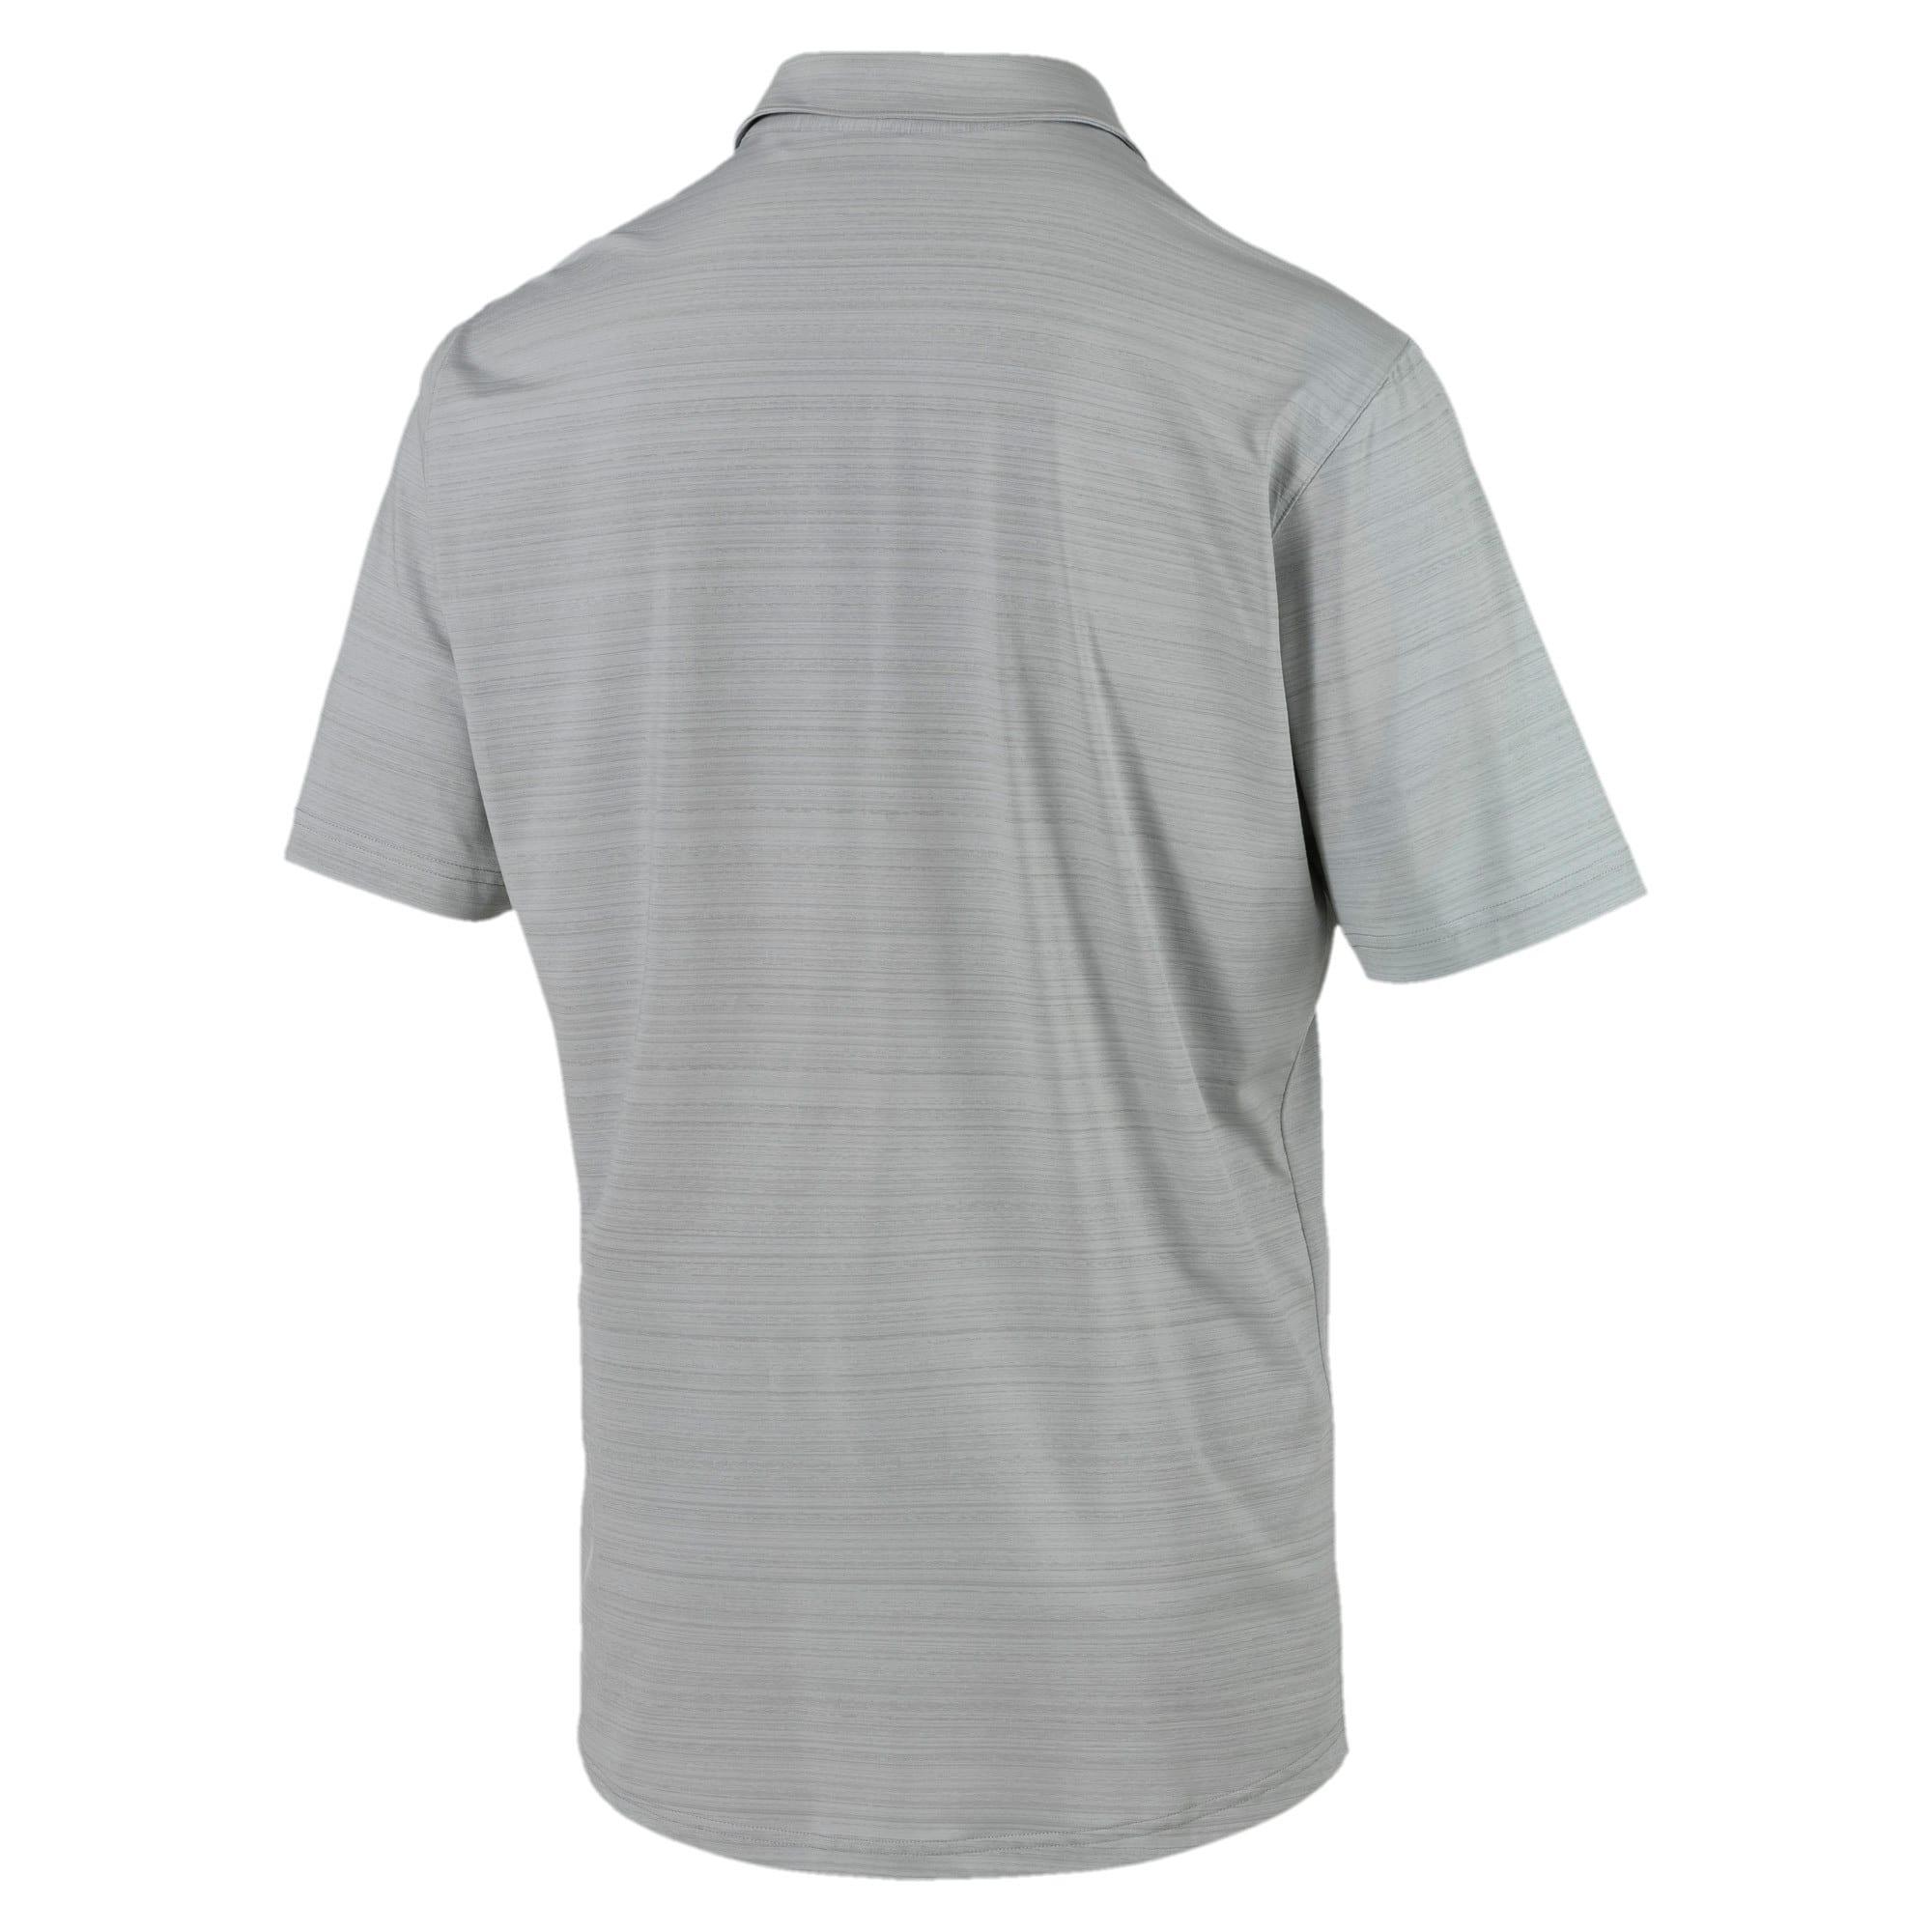 Thumbnail 5 of Breezer Short Sleeve Men's Golf Shirt, Quarry, medium